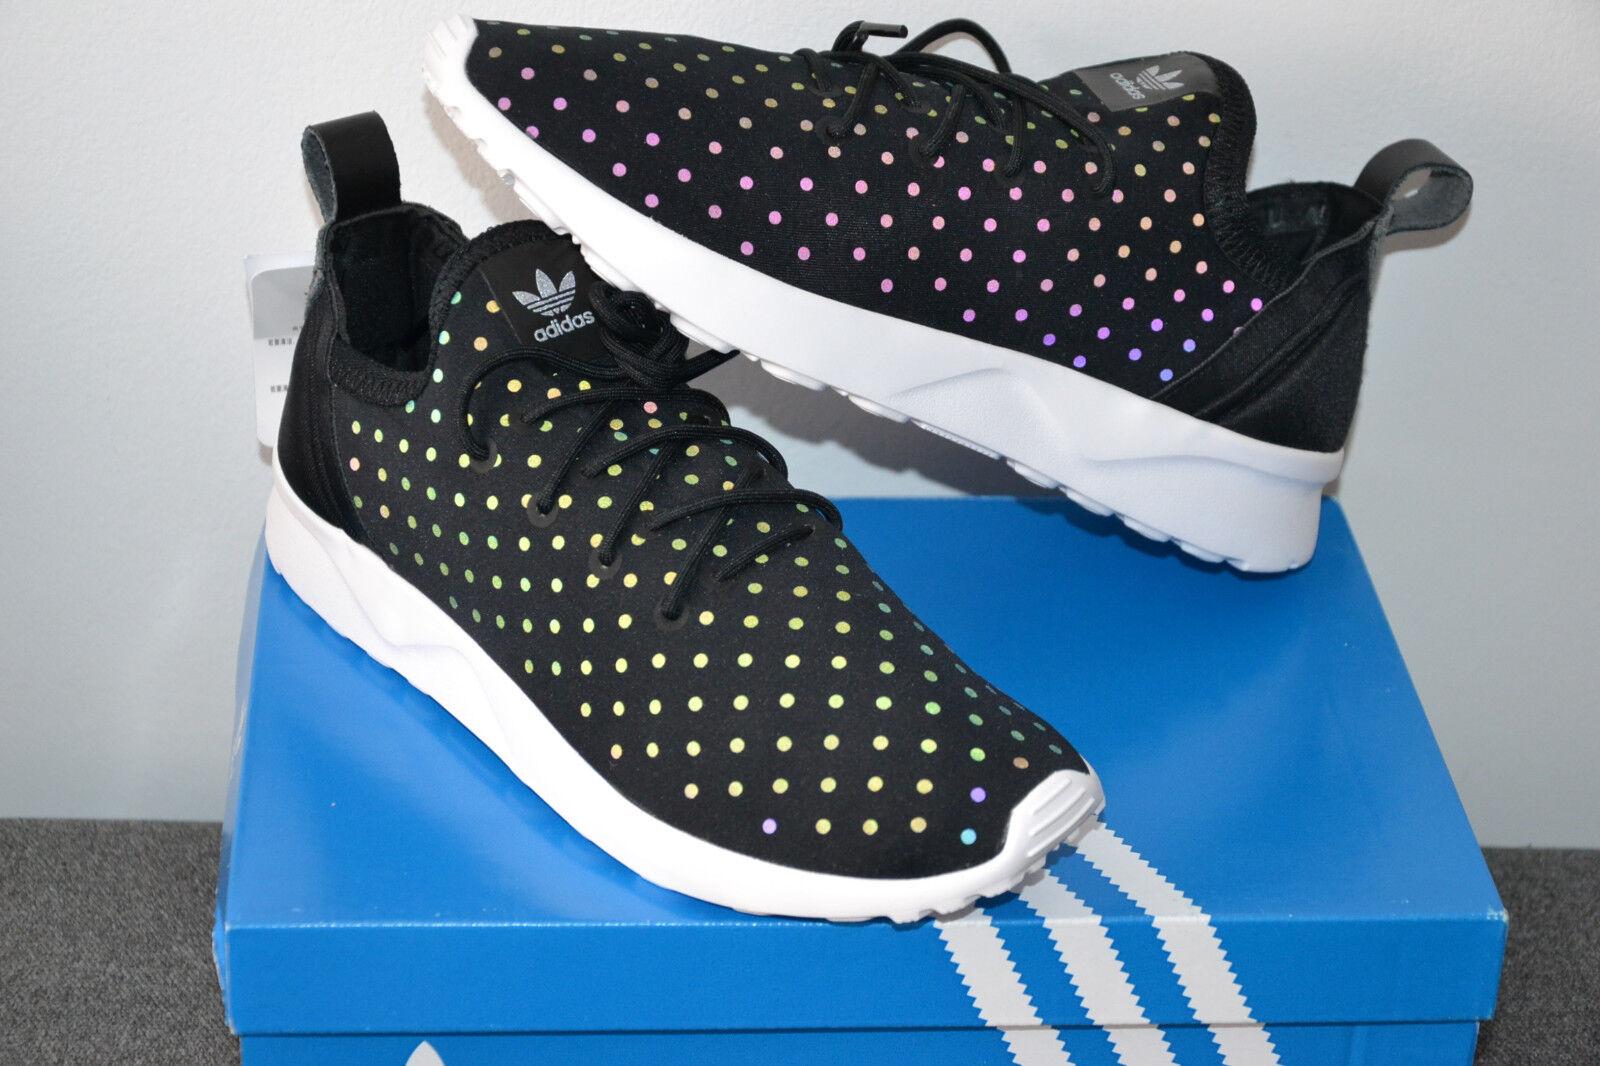 Women's-ADIDAS-ZX FLUX ADV -VIRTUE SOCK W XENO Originals-Trainers shoes